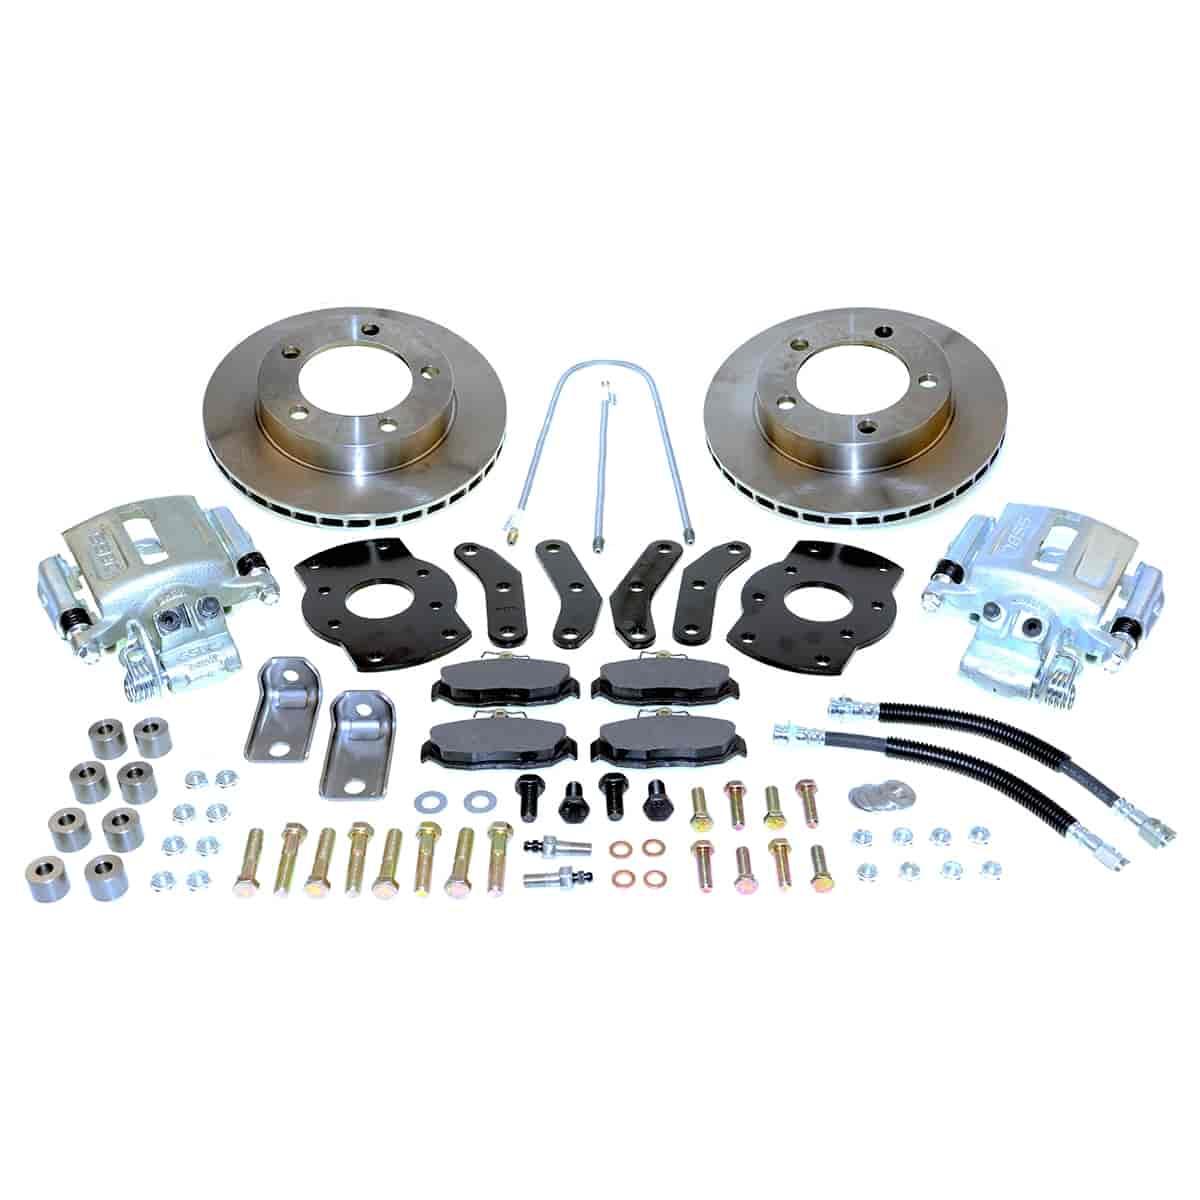 SSBC Single Piston Rear Disc Brake Conversion Kit For AMC 20 1-piece Axles